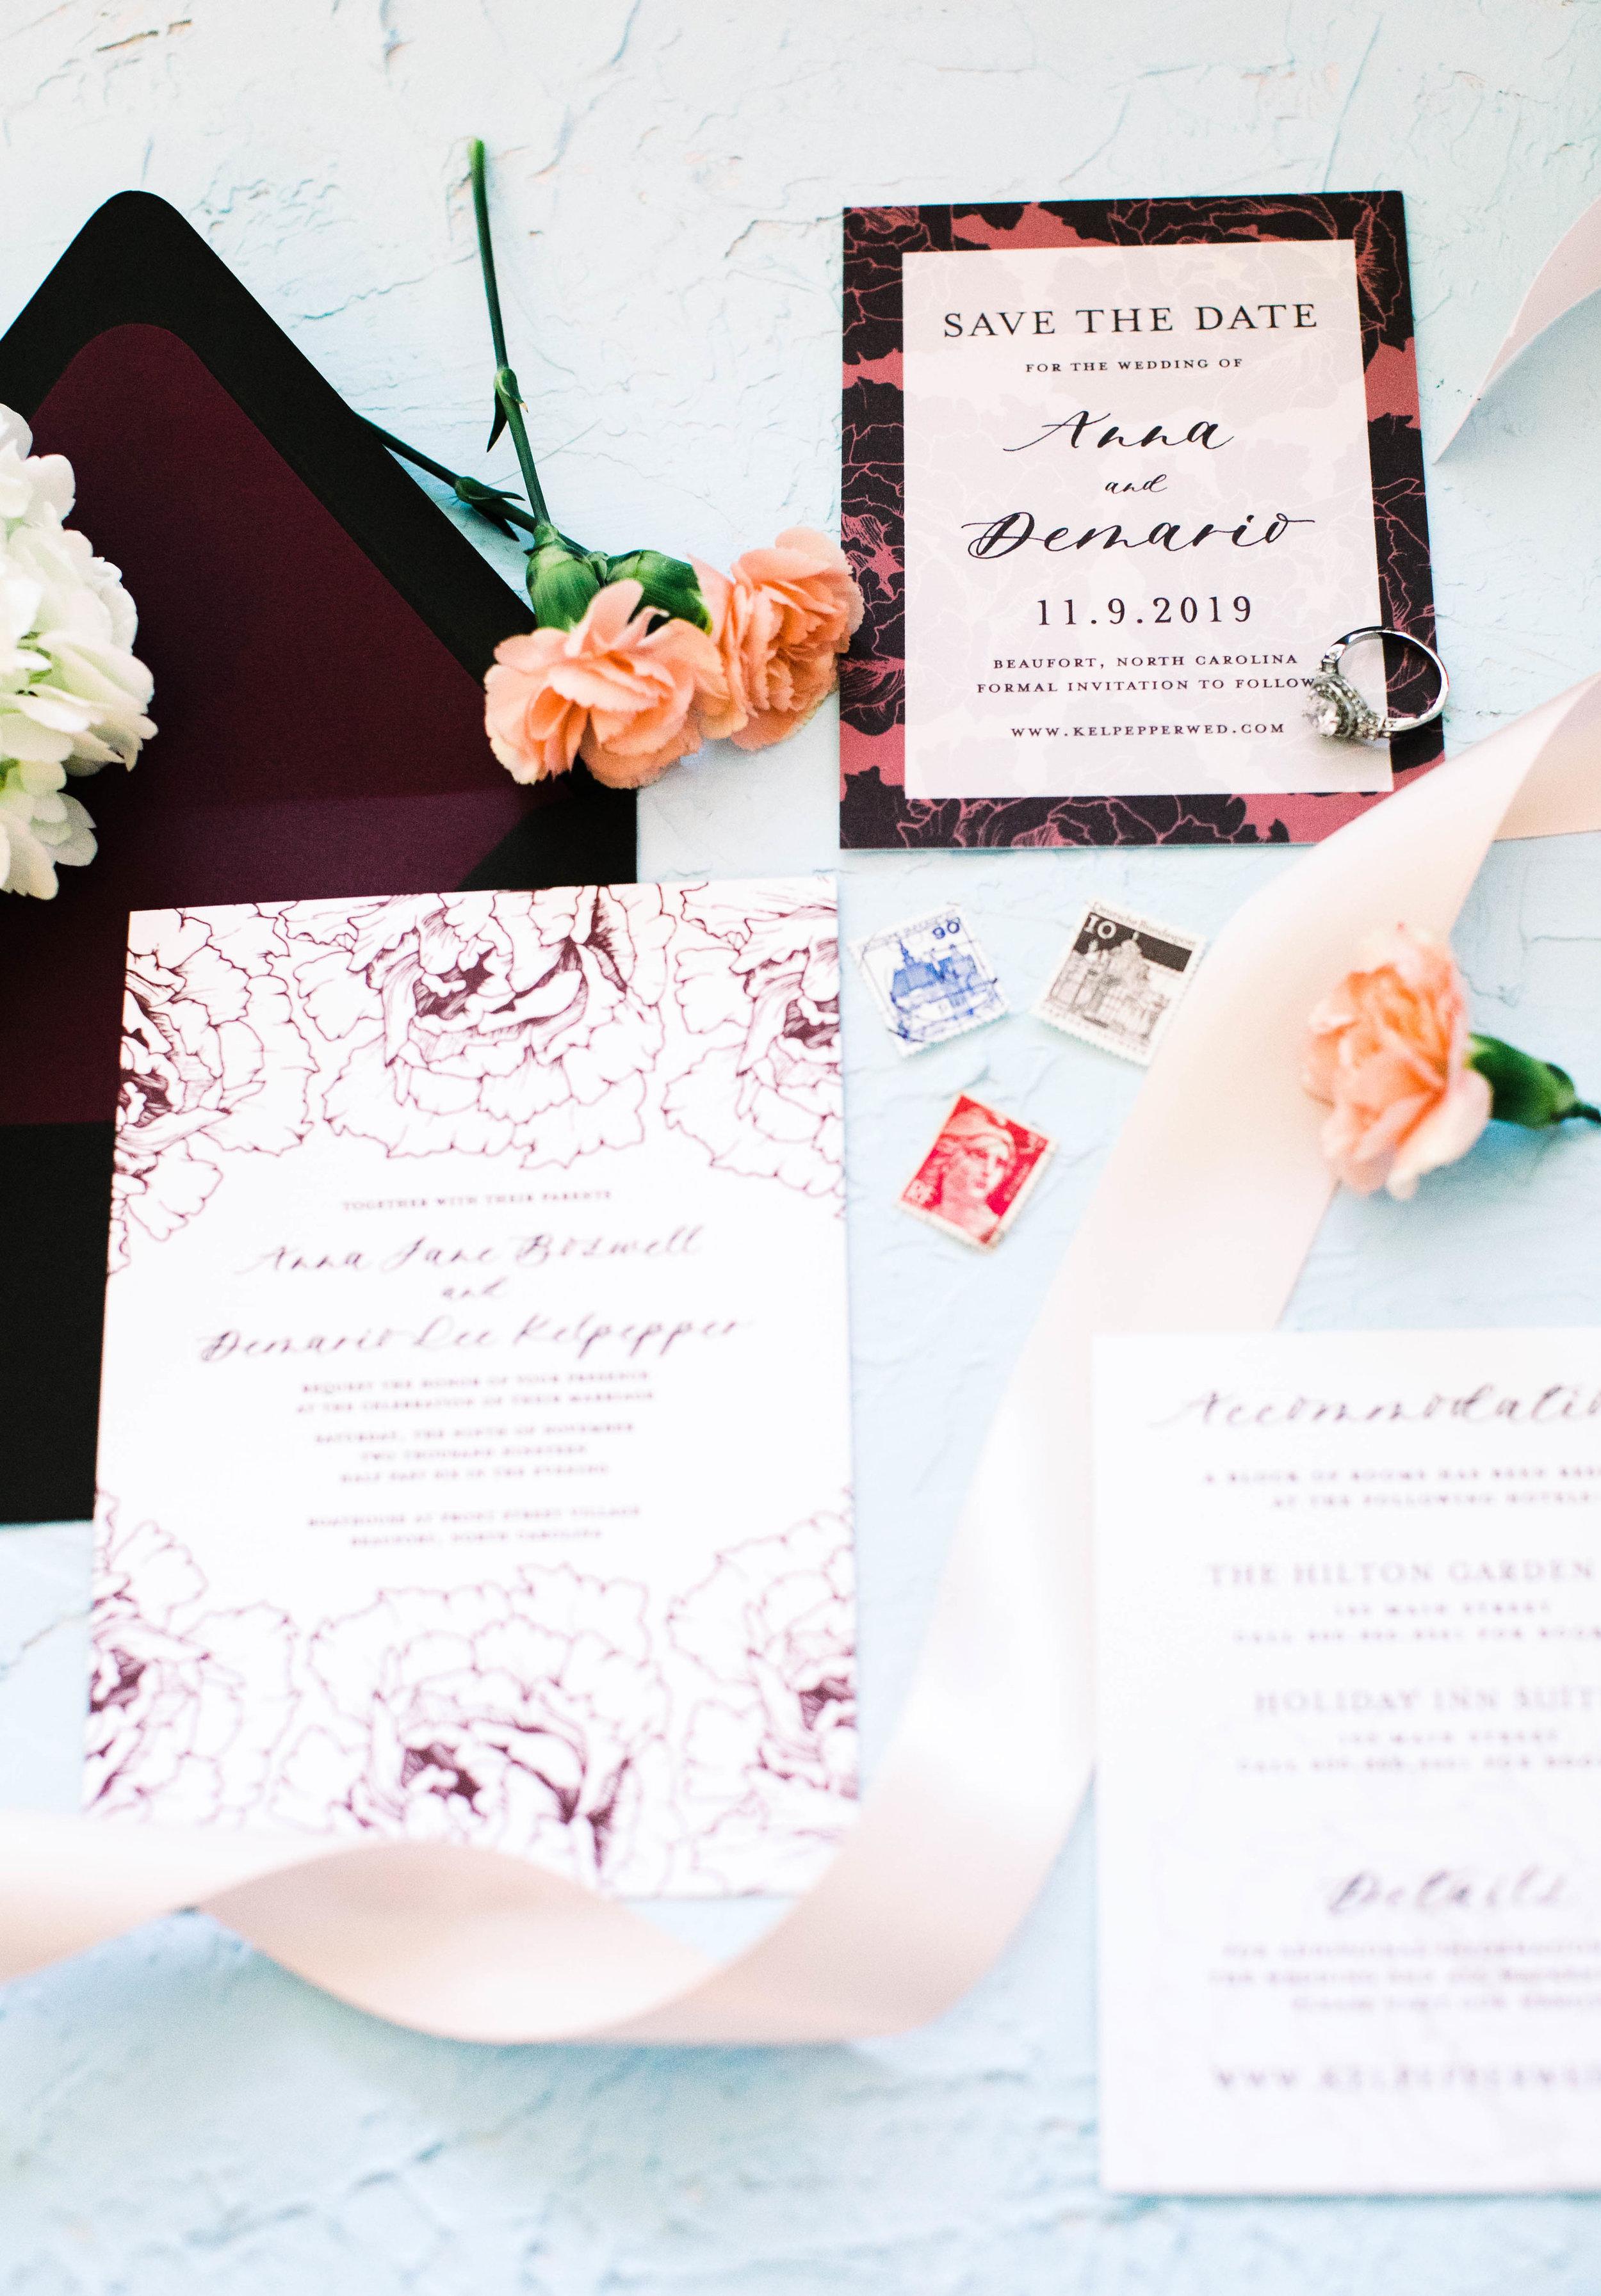 Anna Hand Drawn Wedding Invitation Burgundy Peonies Feathered Heart Prints3W2A0354.jpg